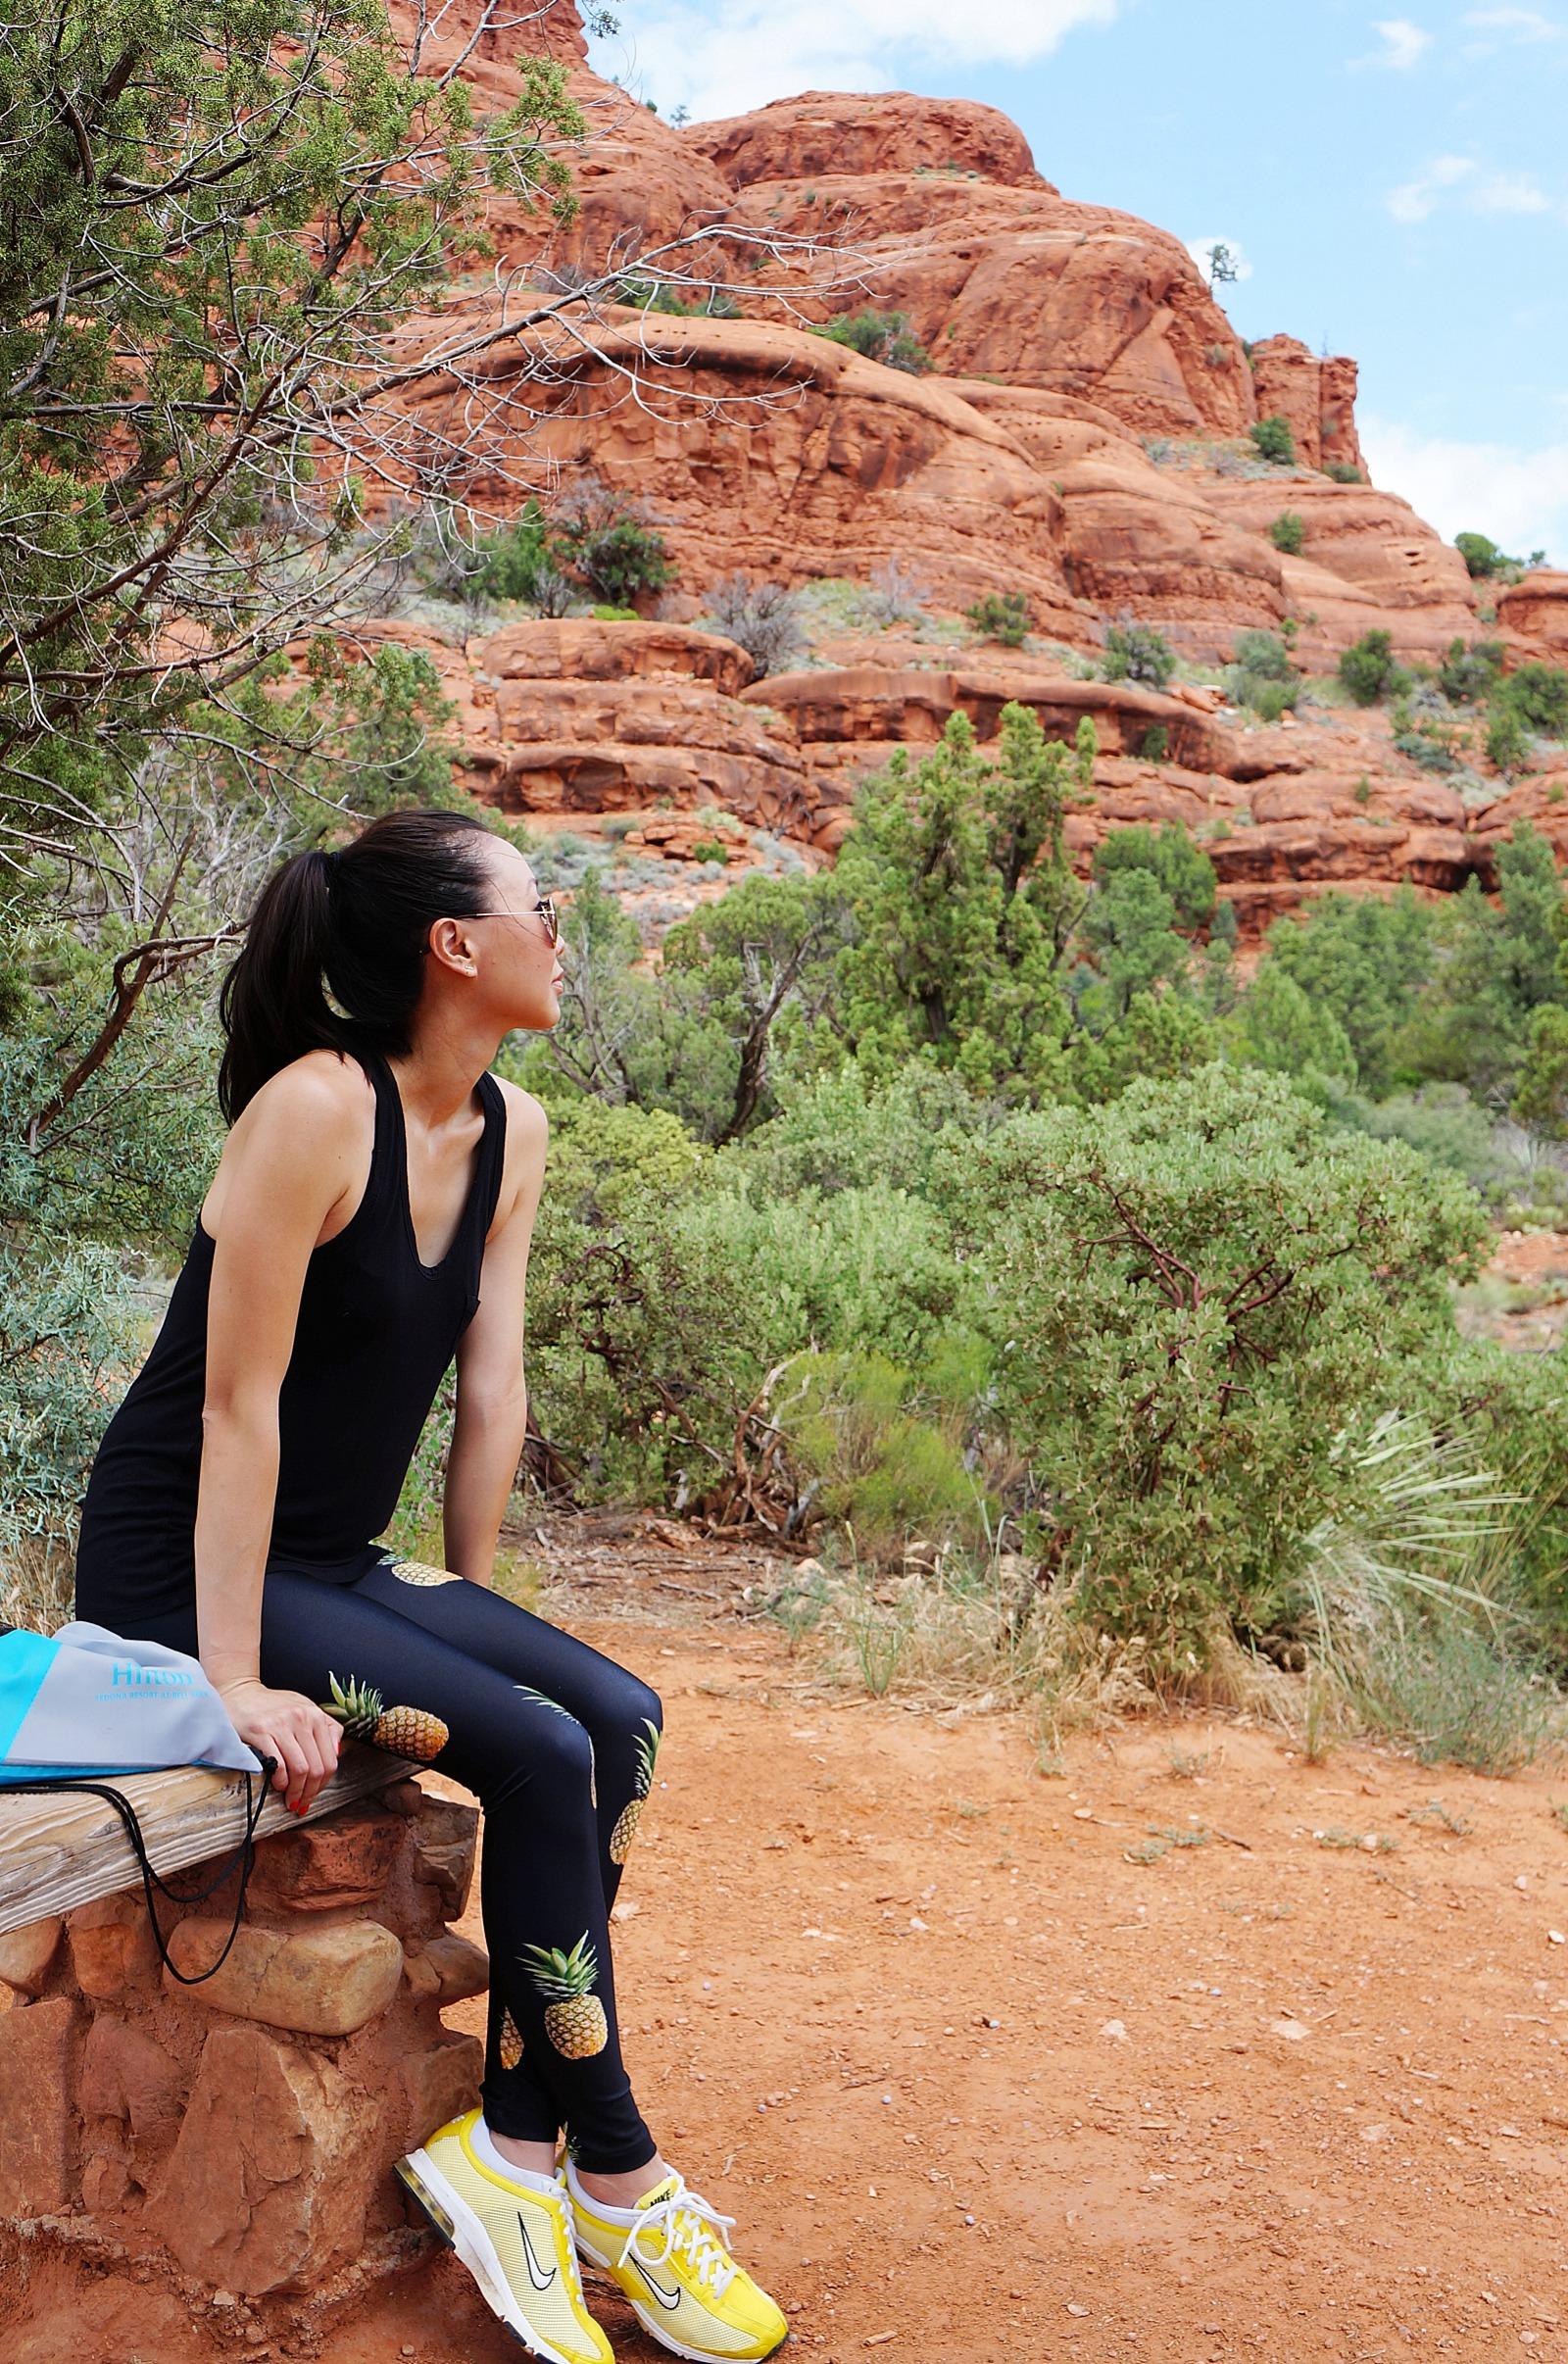 sedona-hilton-sedona-resort-bell-rock-travel-blogger-arizona-phoenix-review_0034